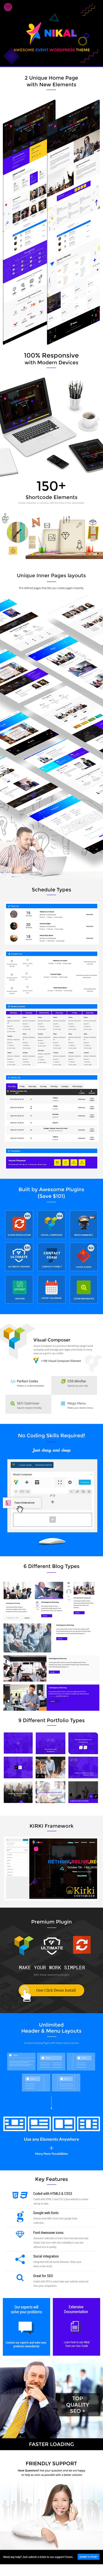 Nikal - Seminar Event Planner WordPress Theme - 1